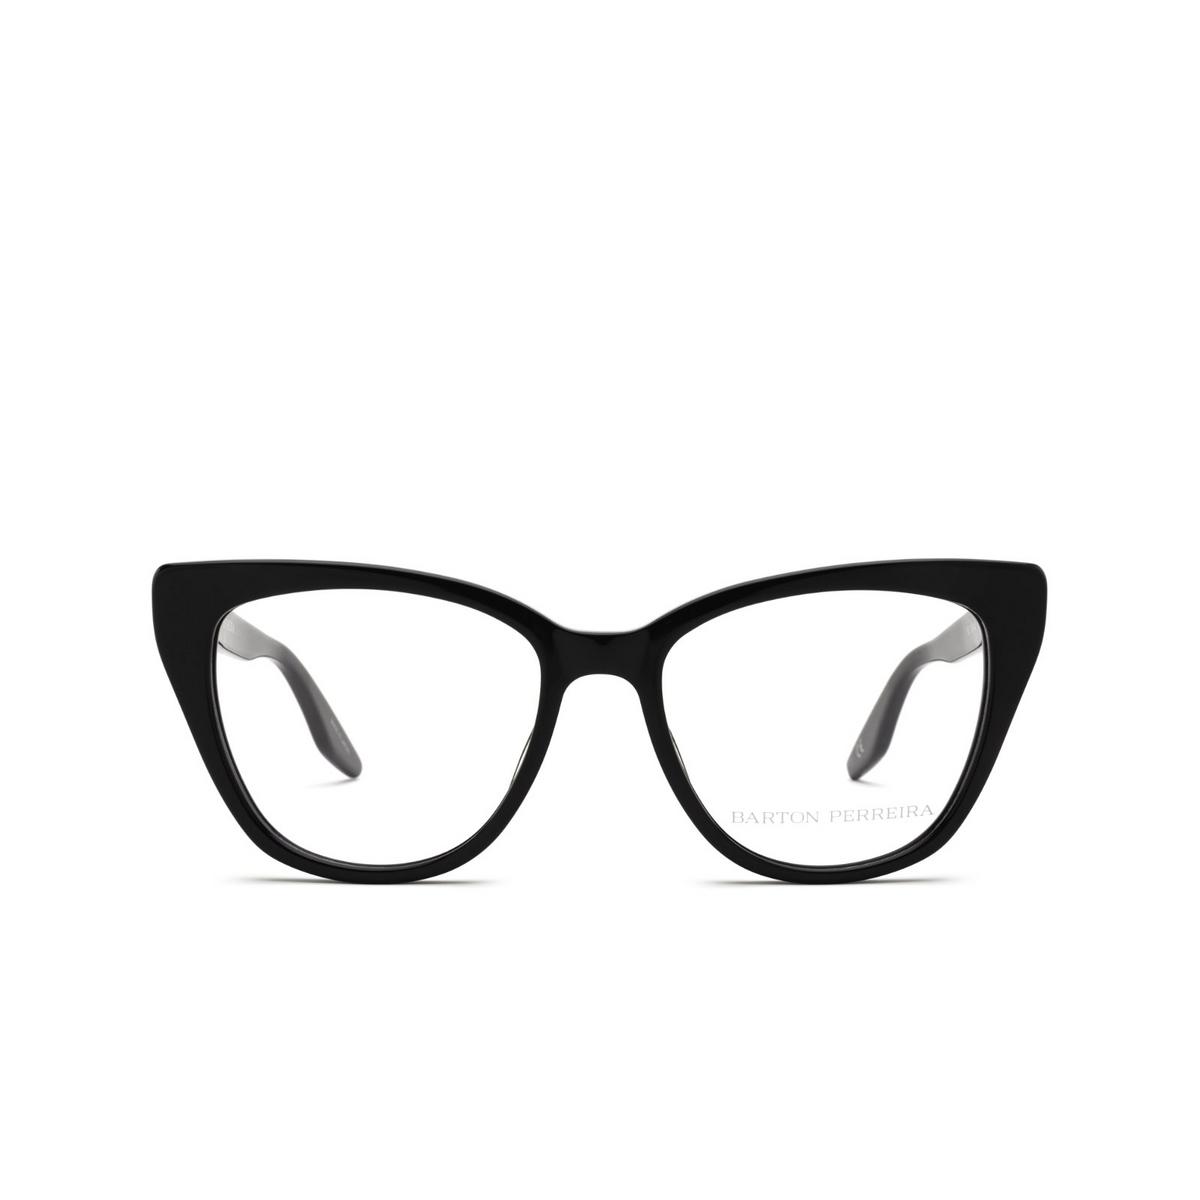 Barton Perreira® Cat-eye Eyeglasses: Falana BP5275 color Black 0EJ - front view.